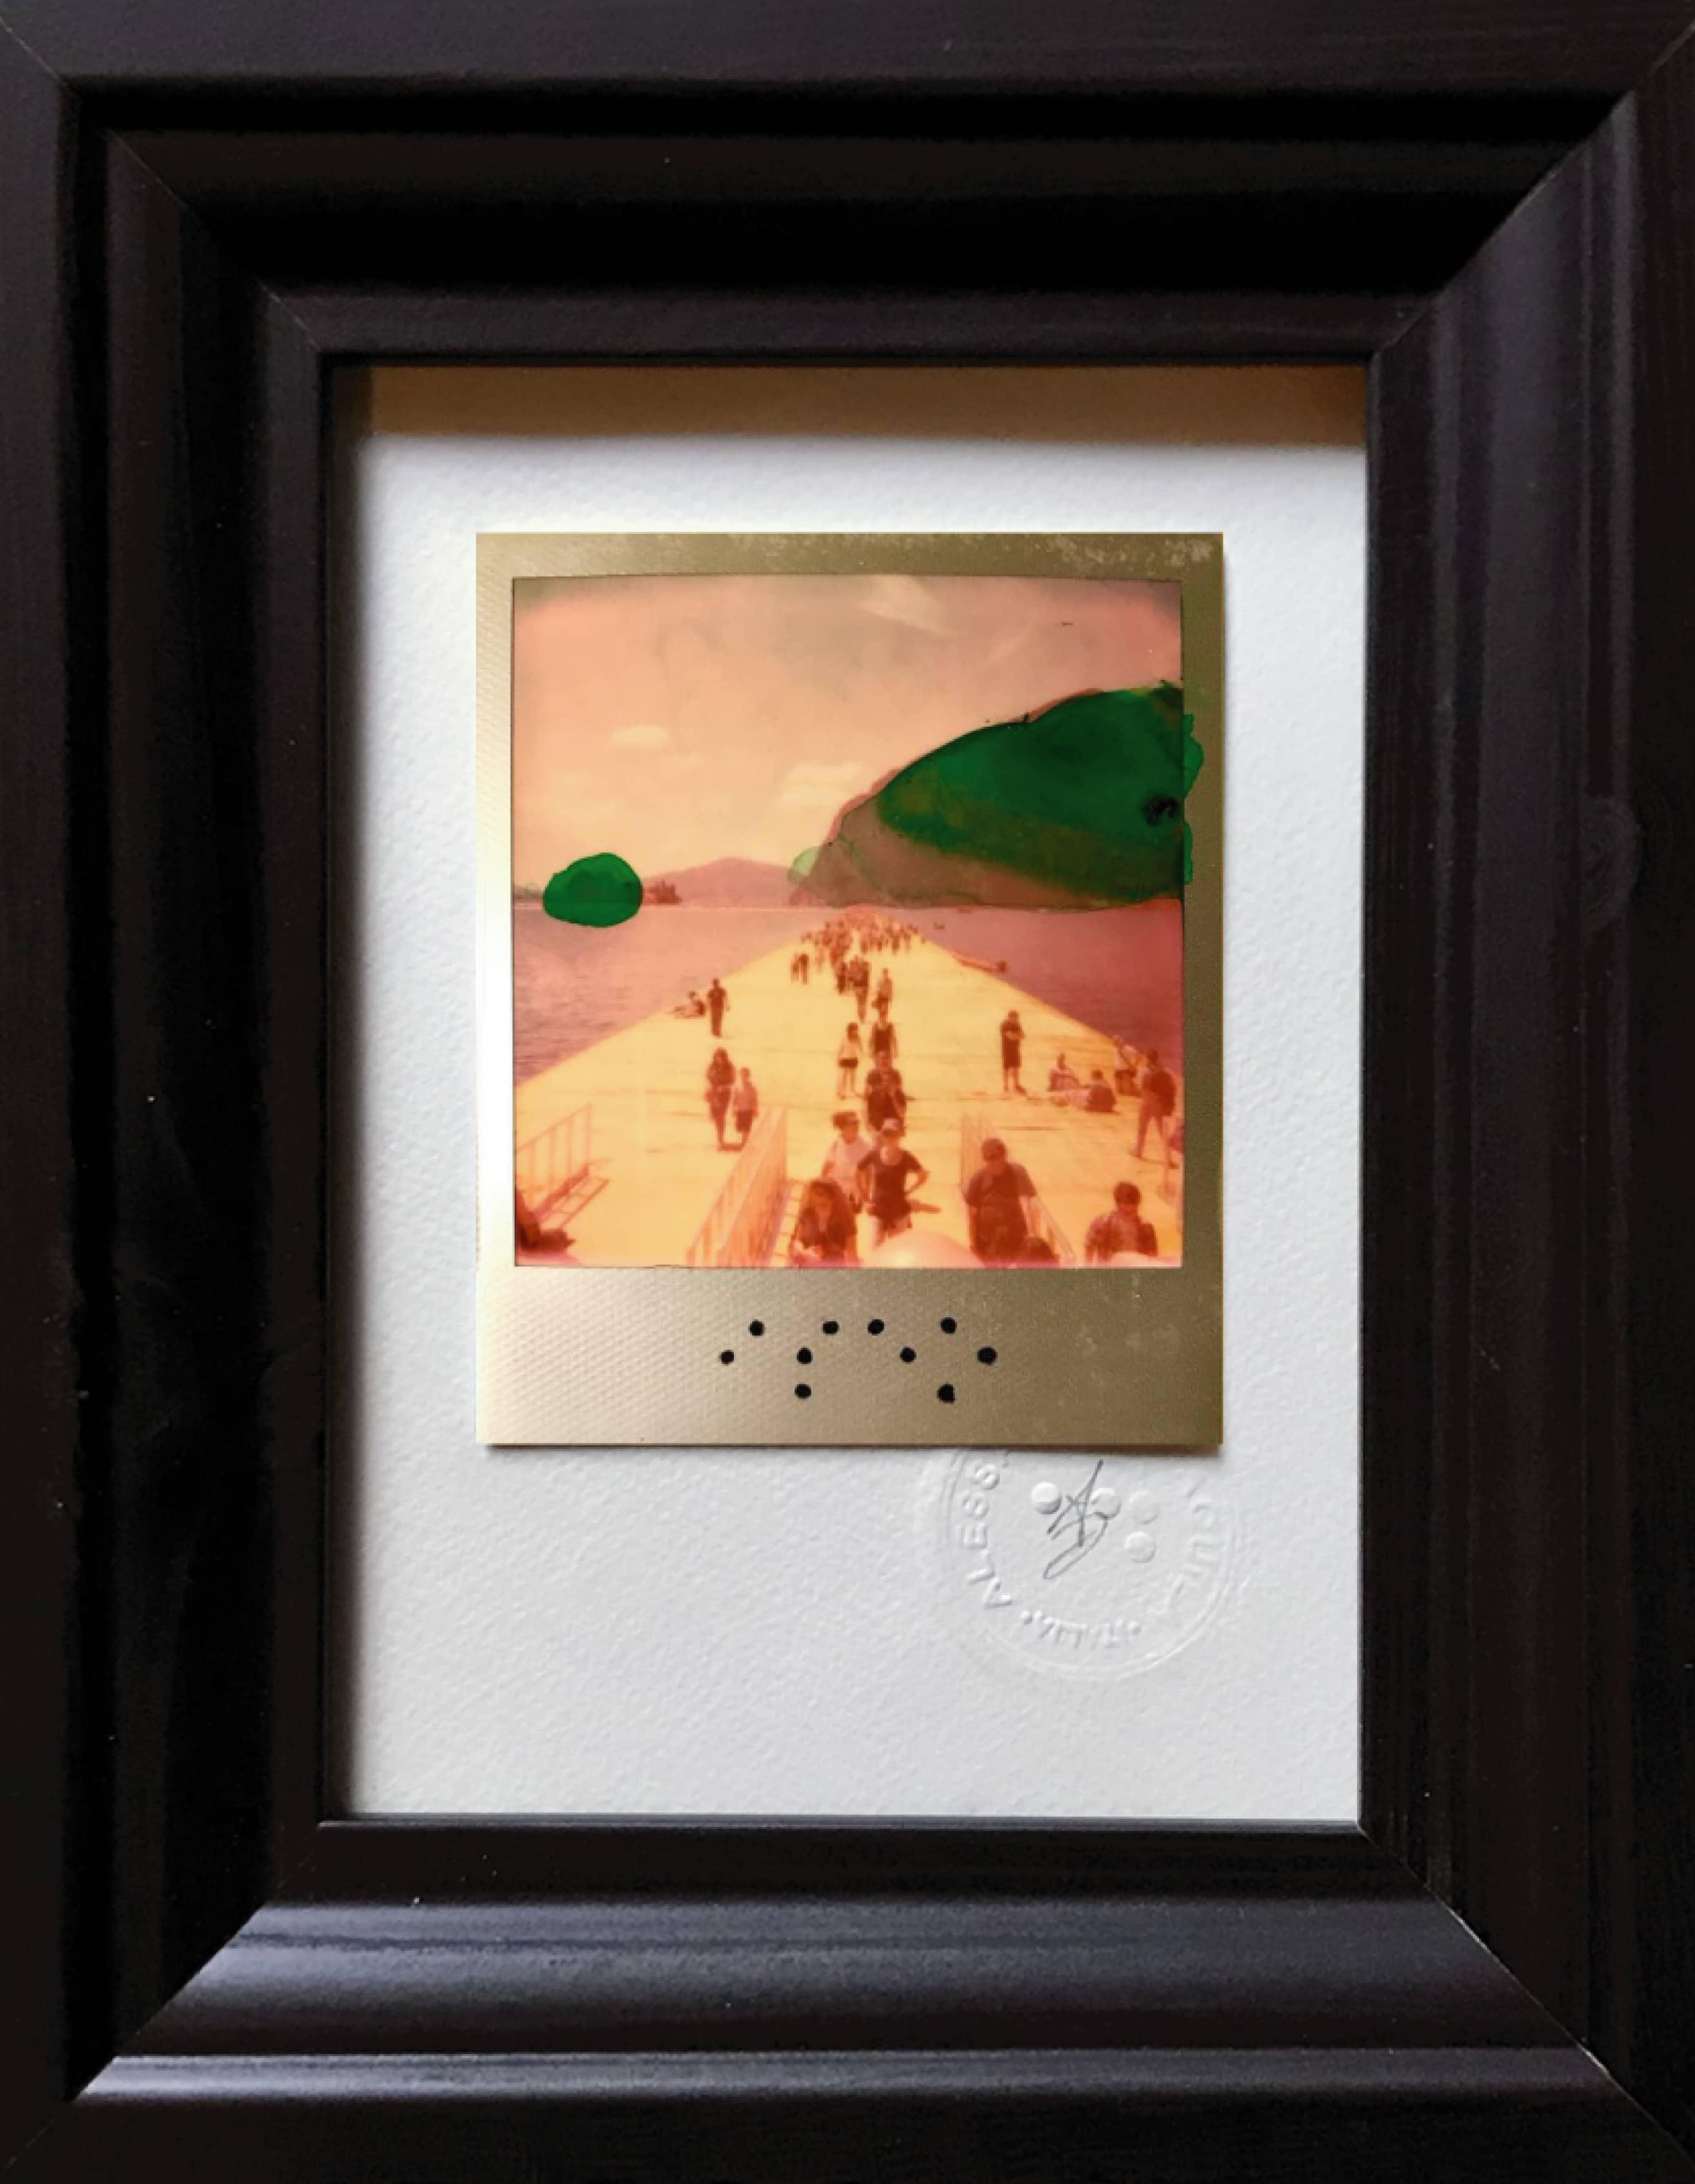 The Floating Polaroid #2